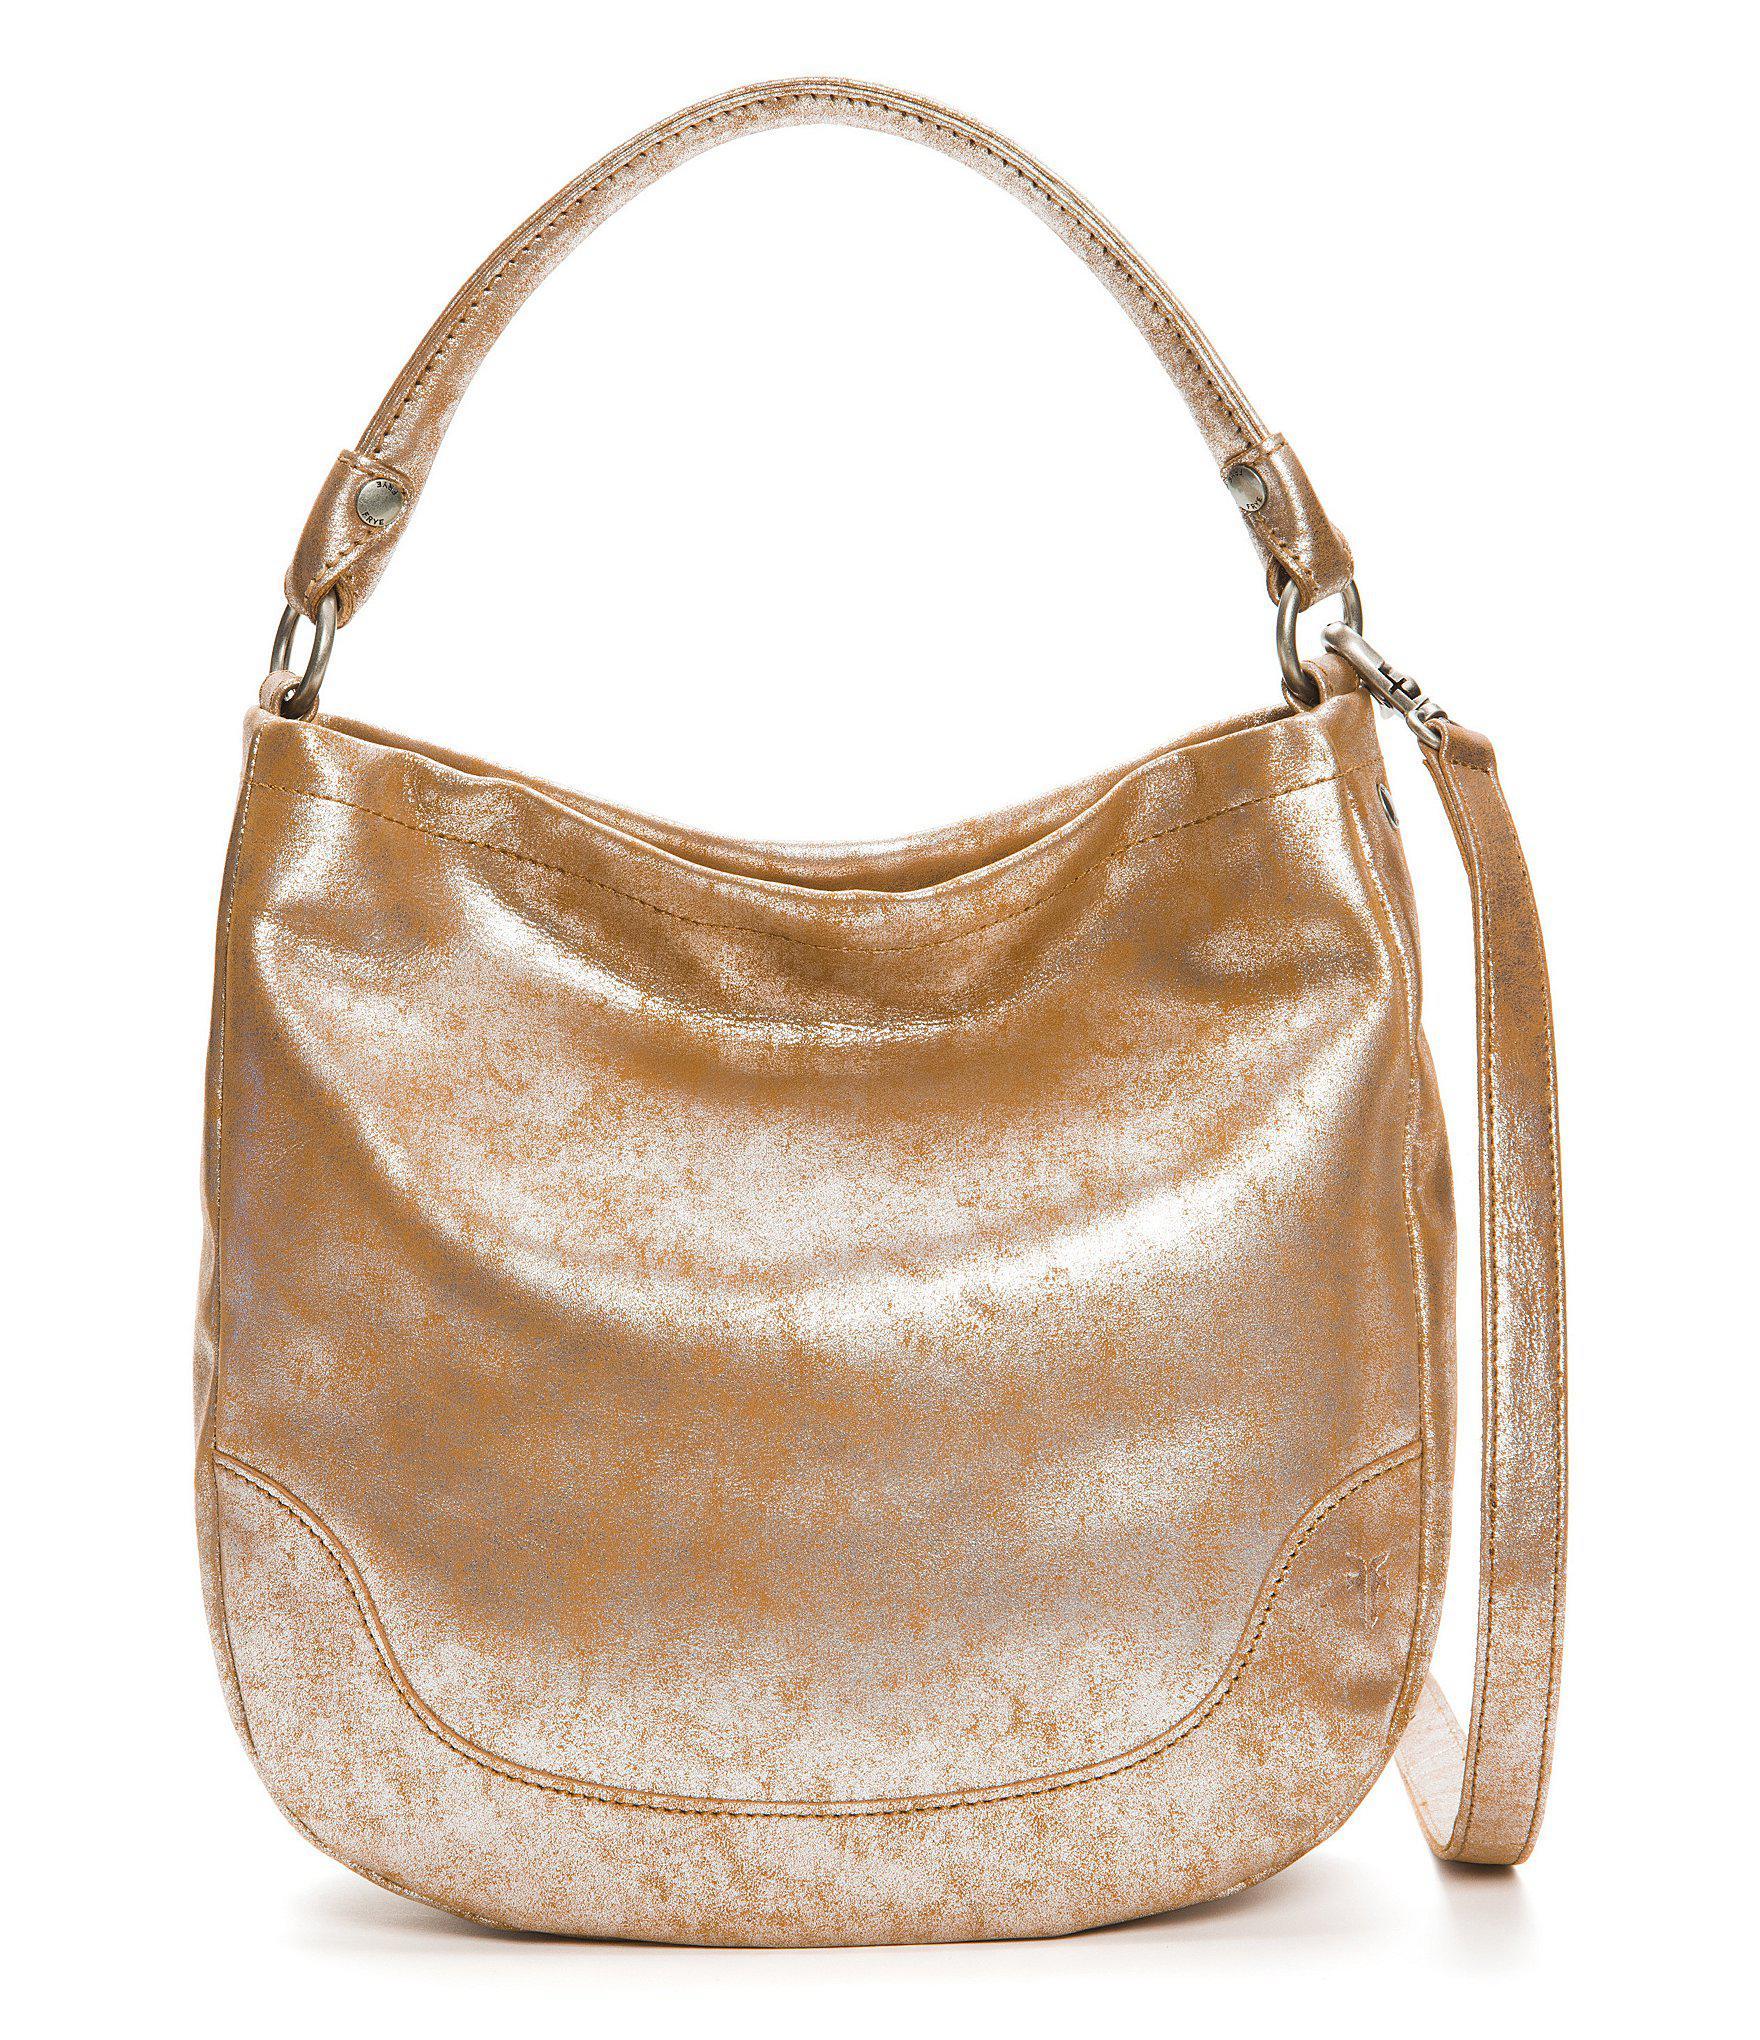 849c3aadf3 Lyst - Frye Melissa Metallic Hobo Bag in Metallic